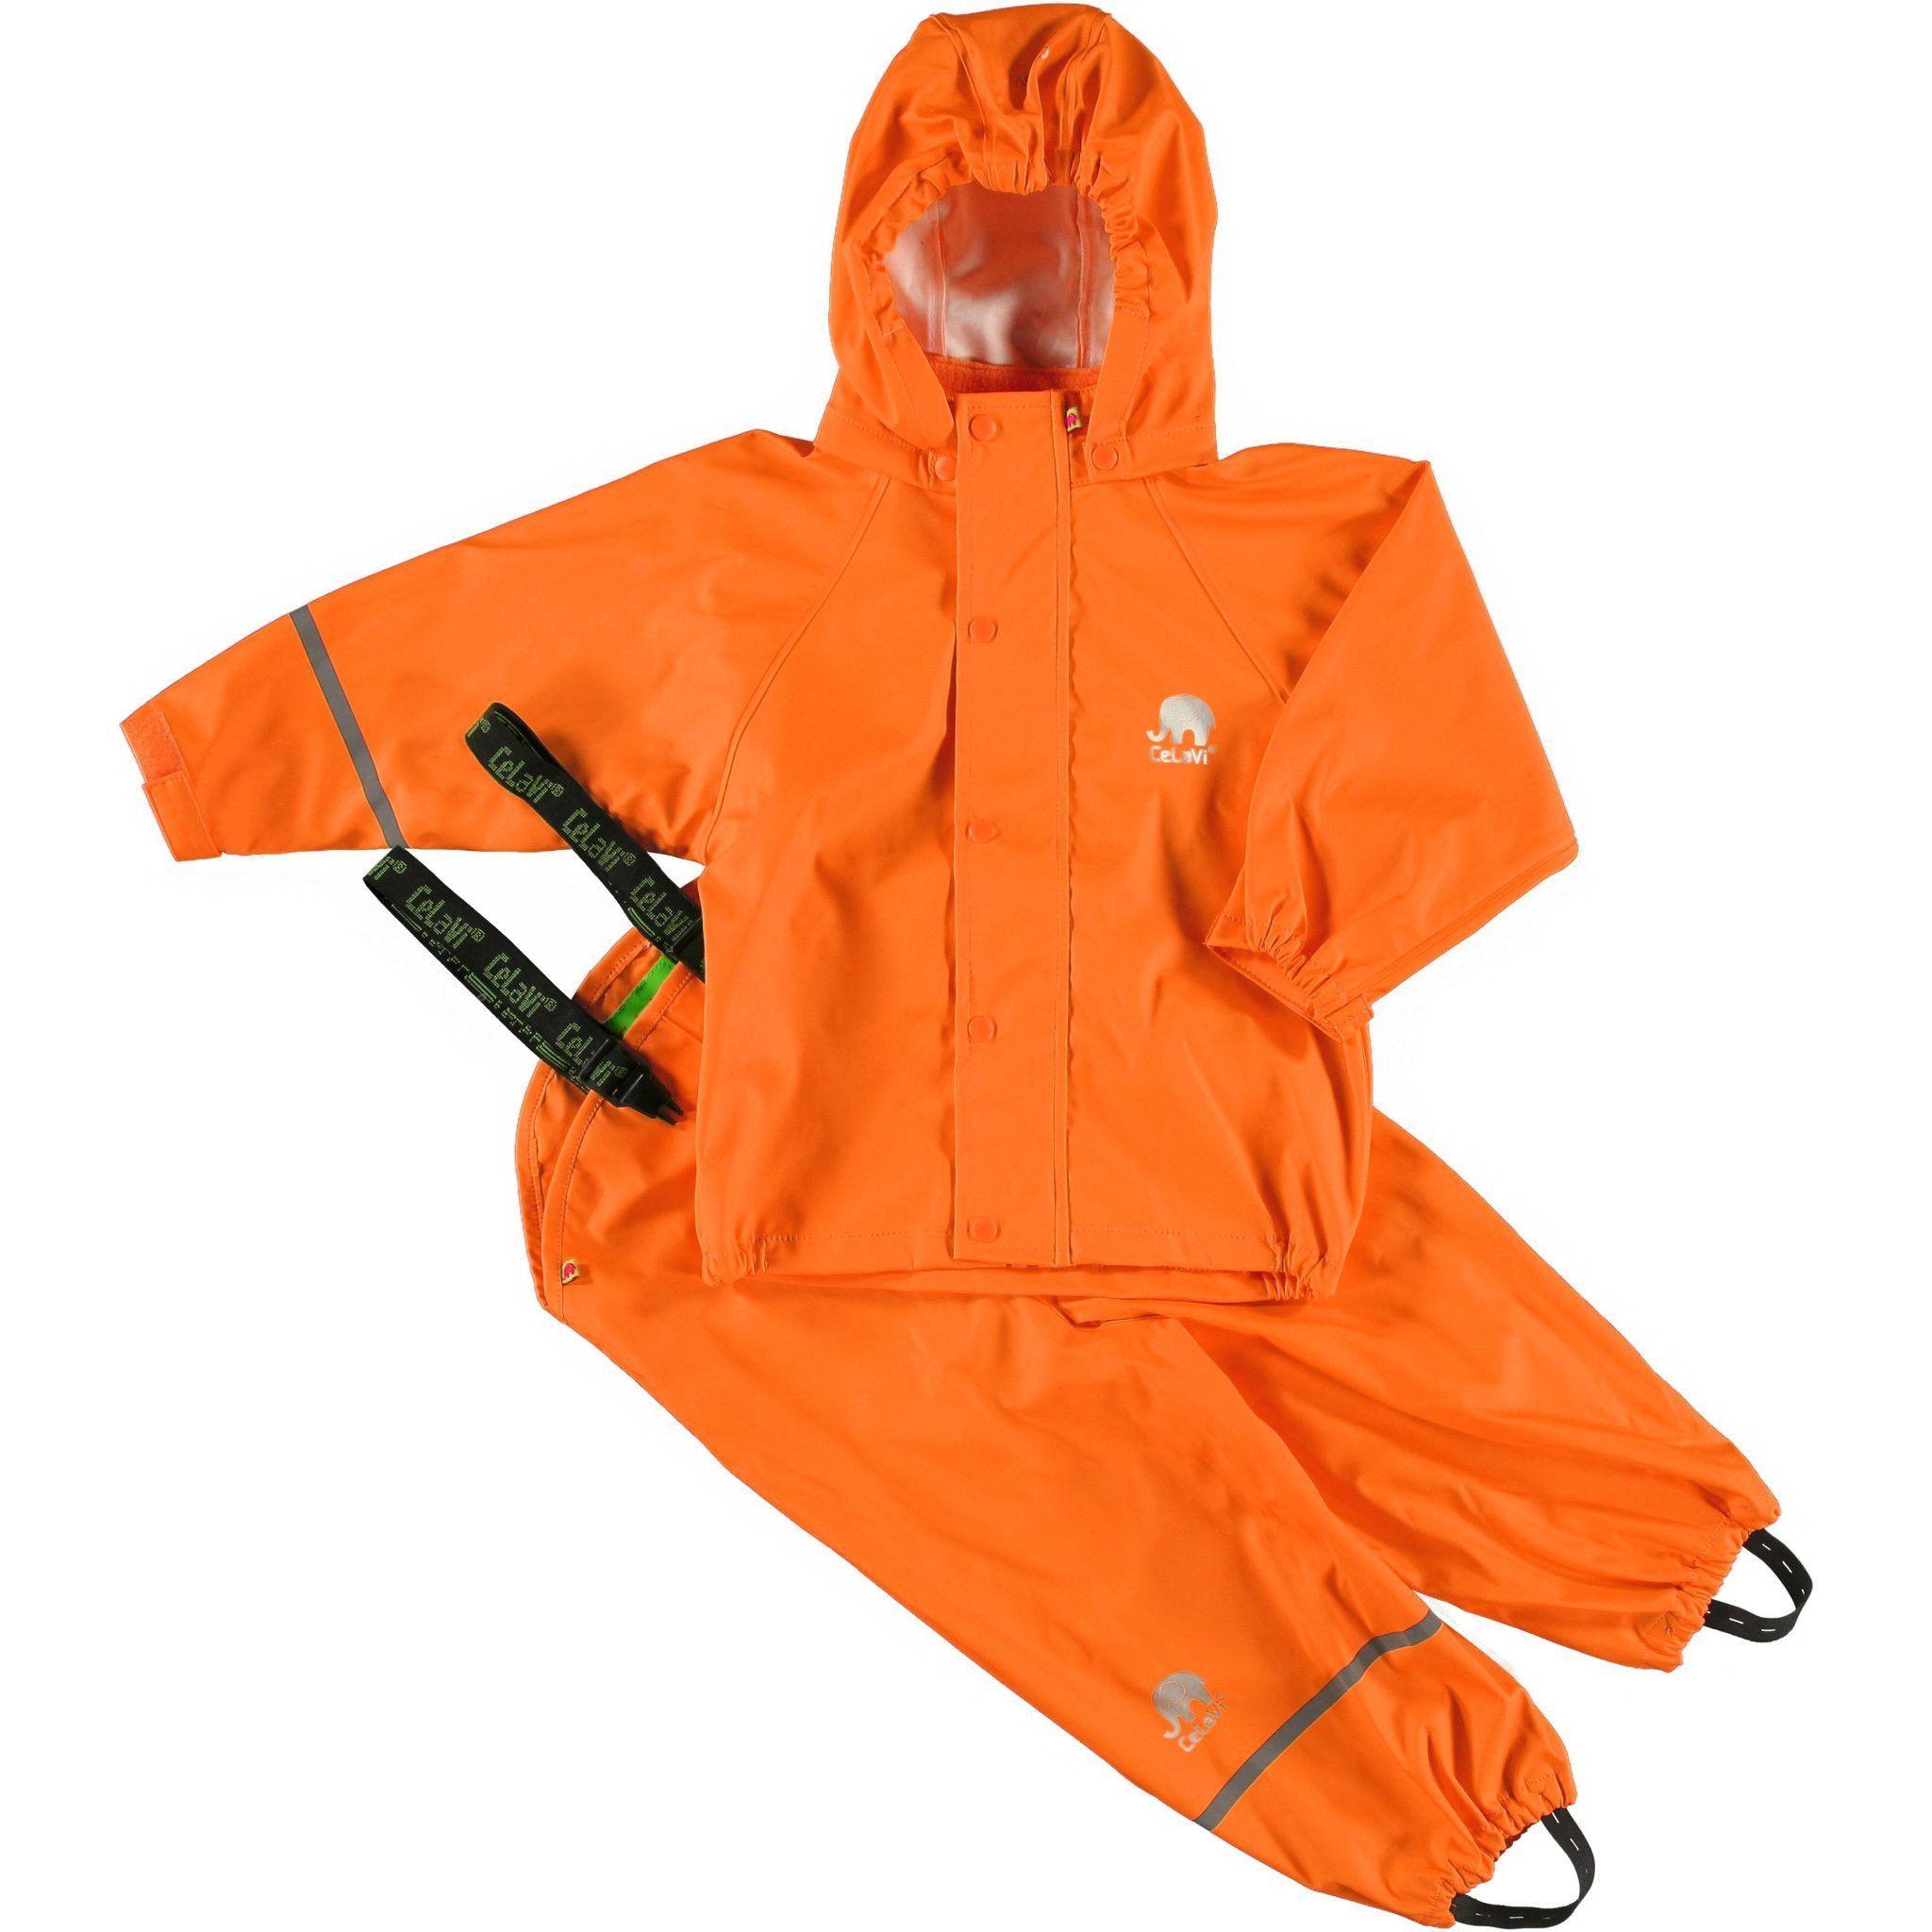 61b38e916 Classic Rain Gear Set - Orange in 2019 | Shop Biddle and Bop | Rain ...